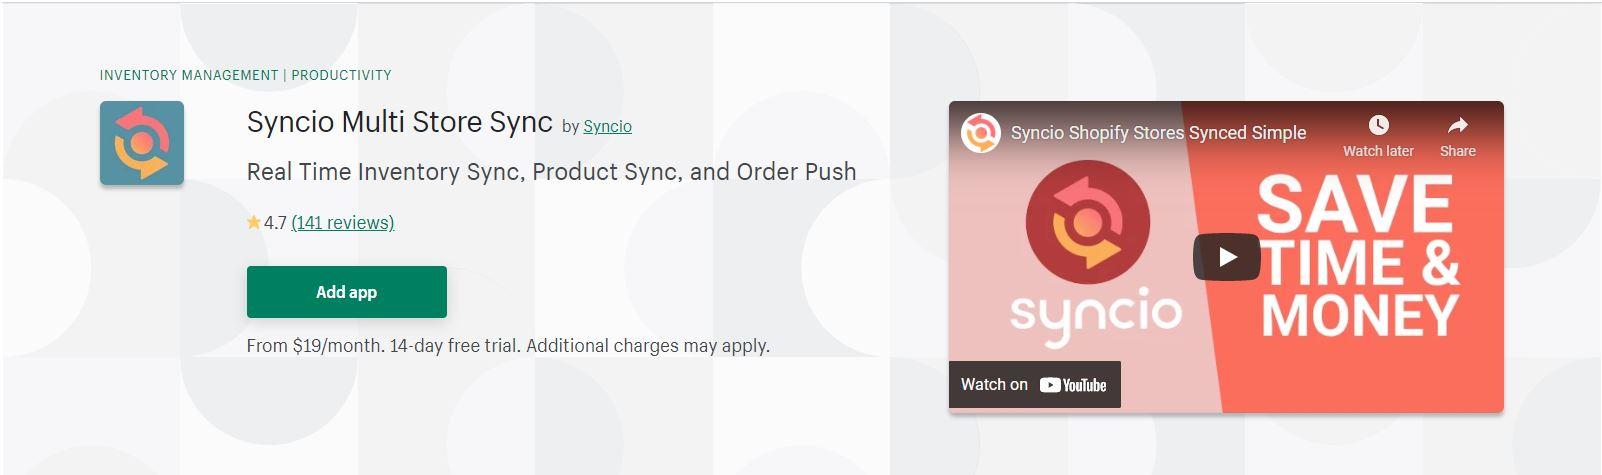 Syncio Multi Store Sync